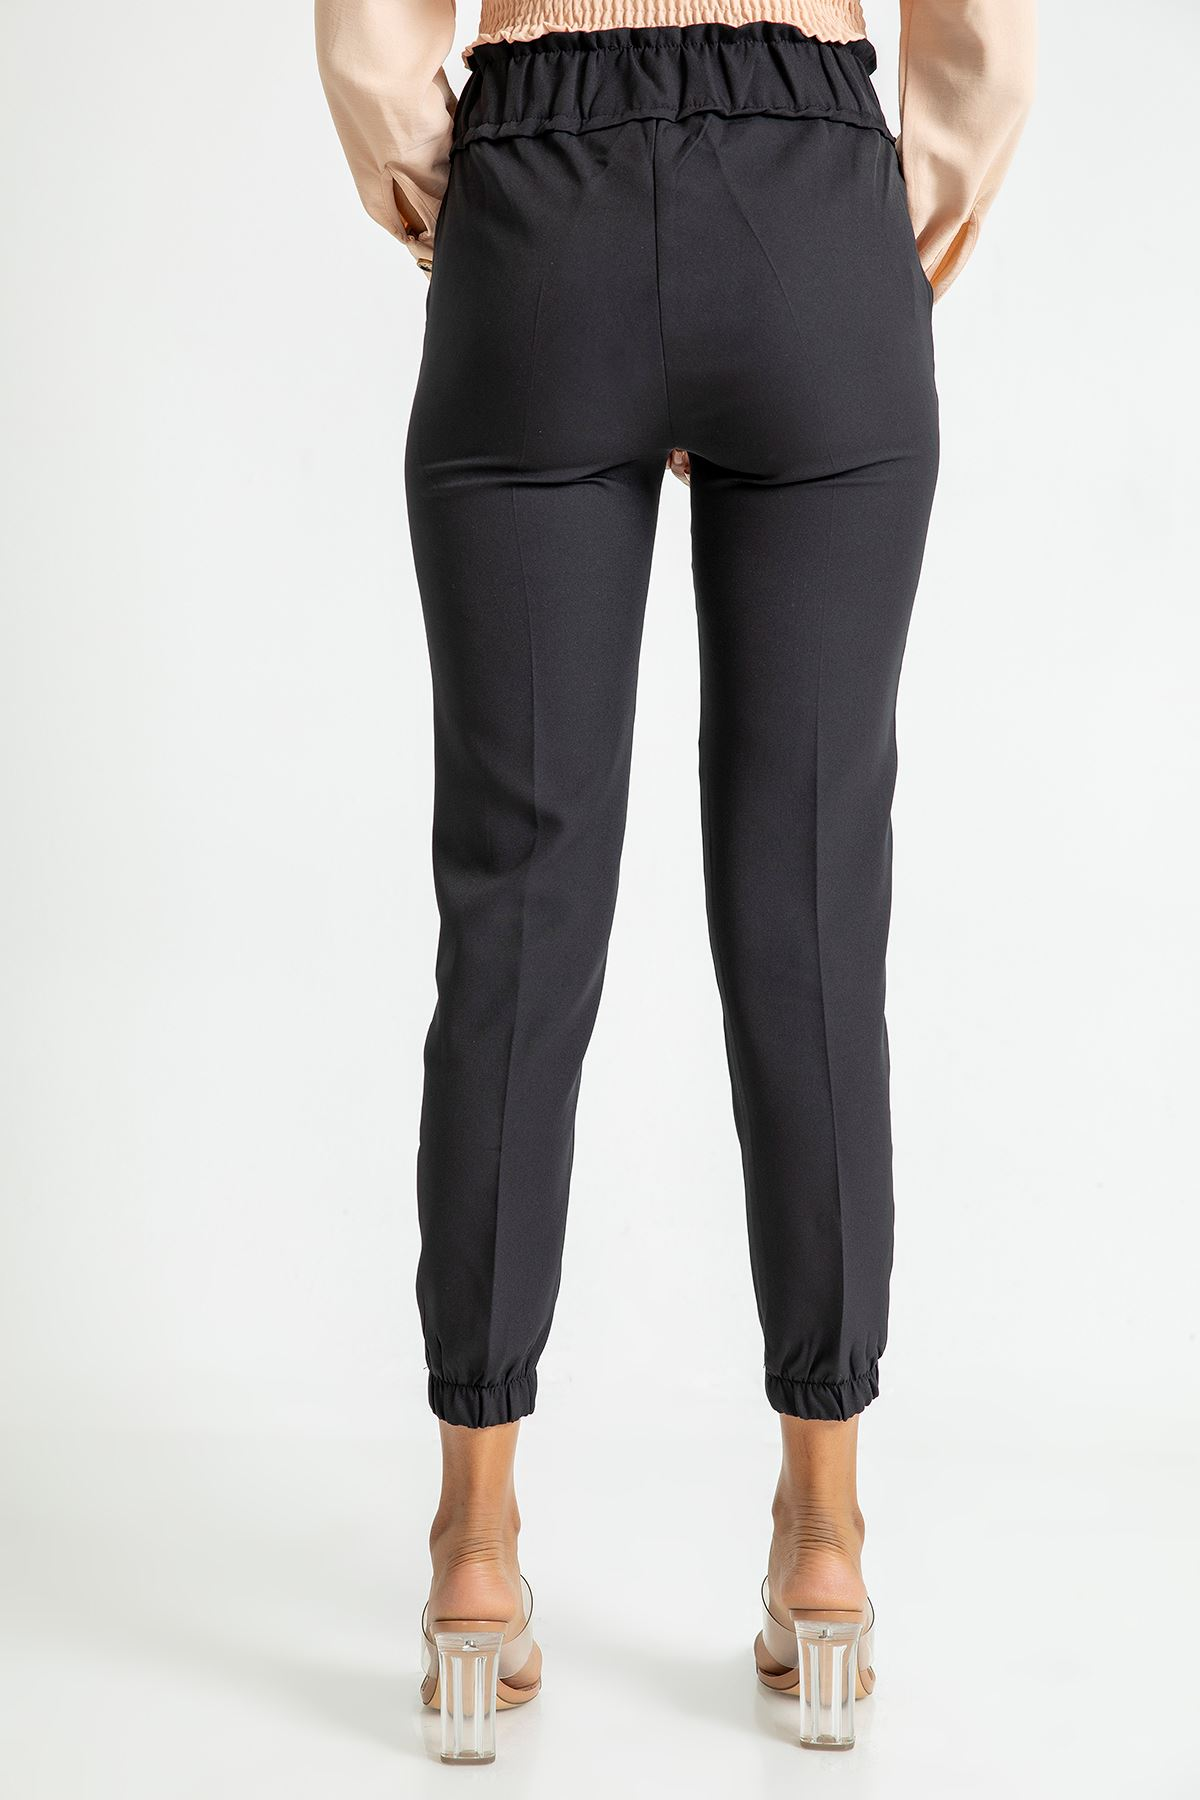 Beli Lastikli Atlas Kumaş Pantolon-Siyah